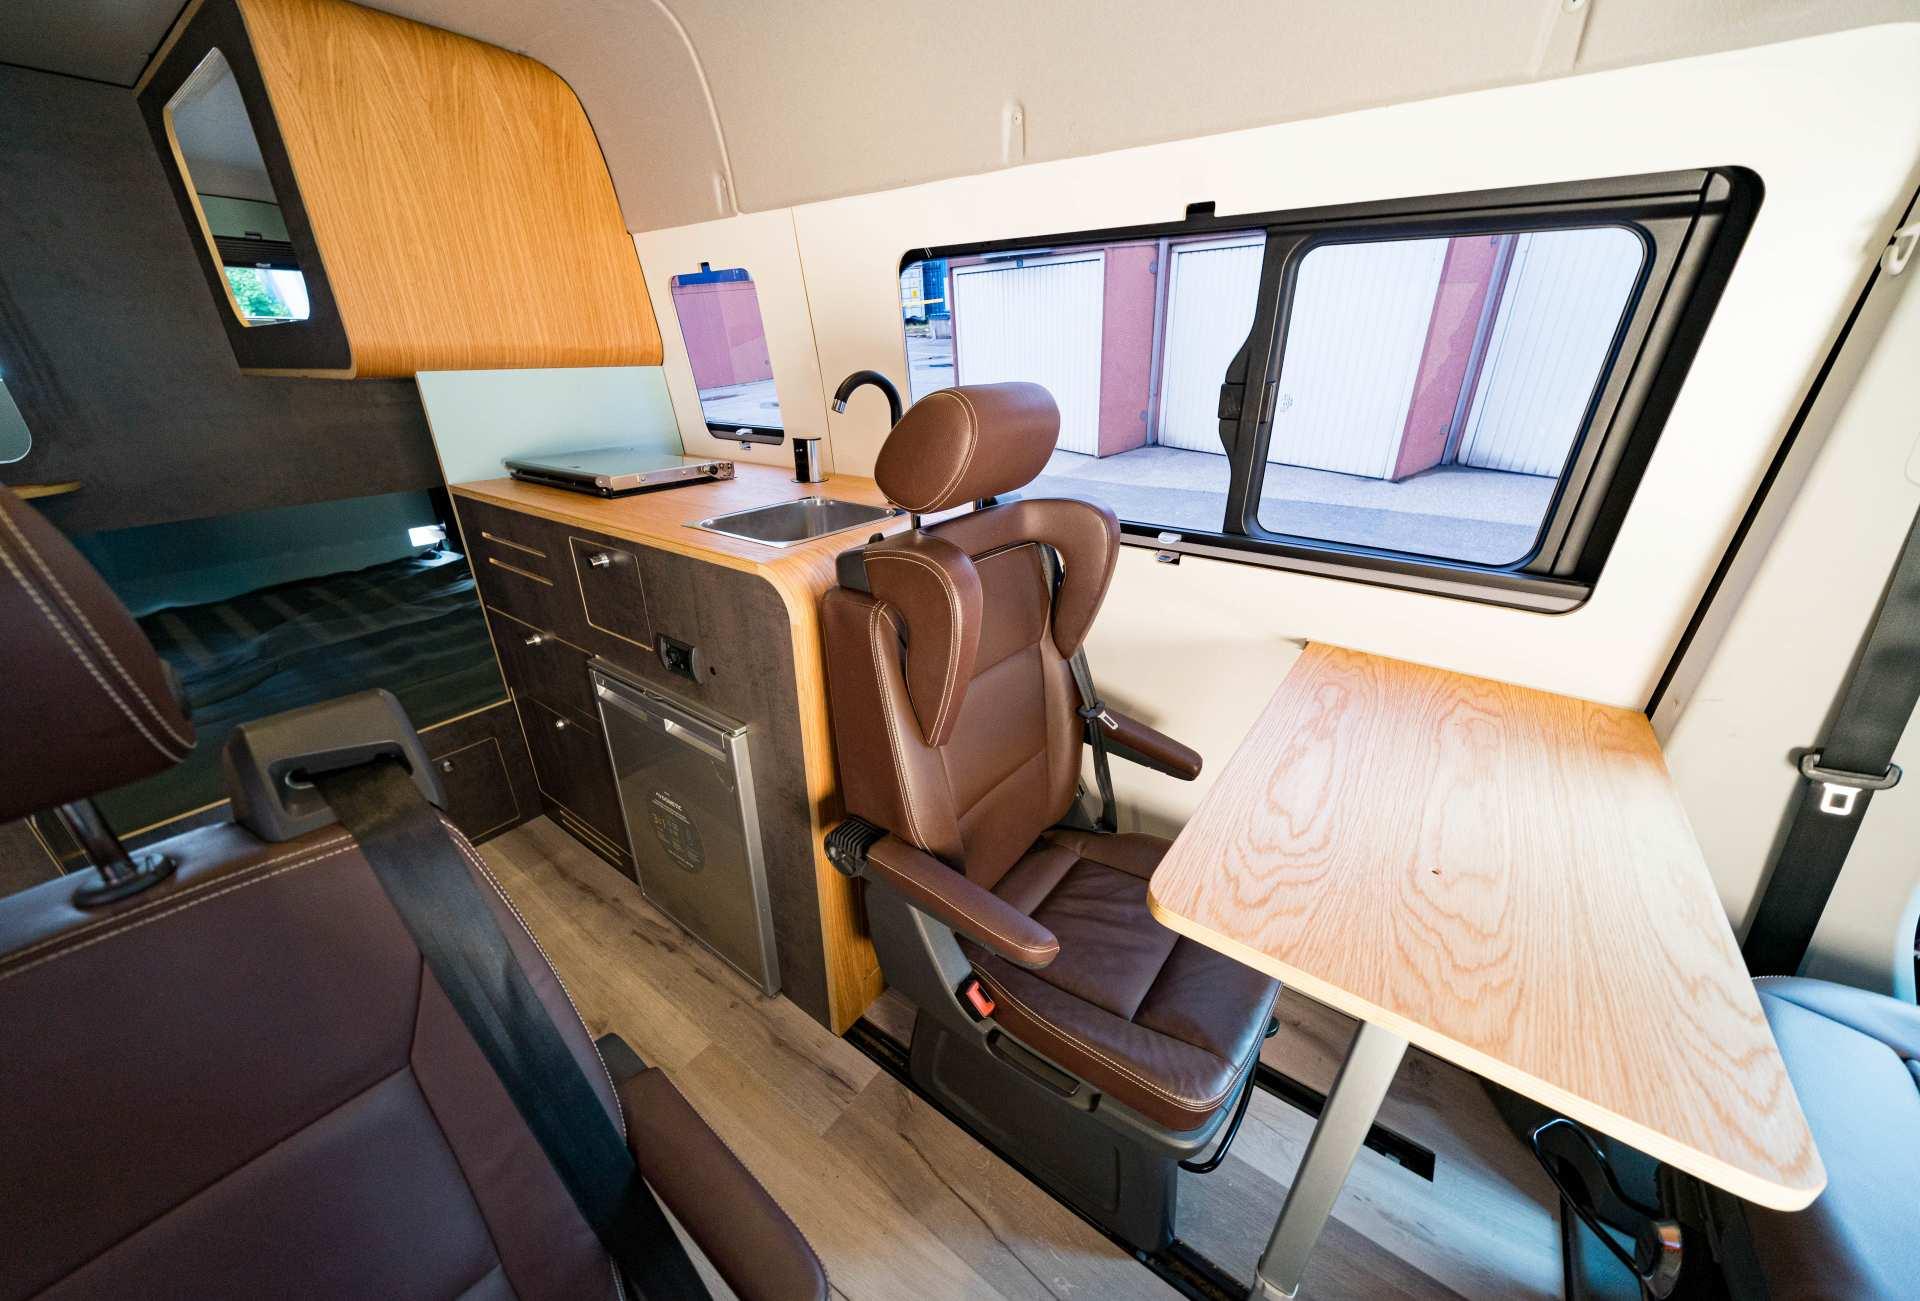 Individualausbau: Full House VW Crafter - 5